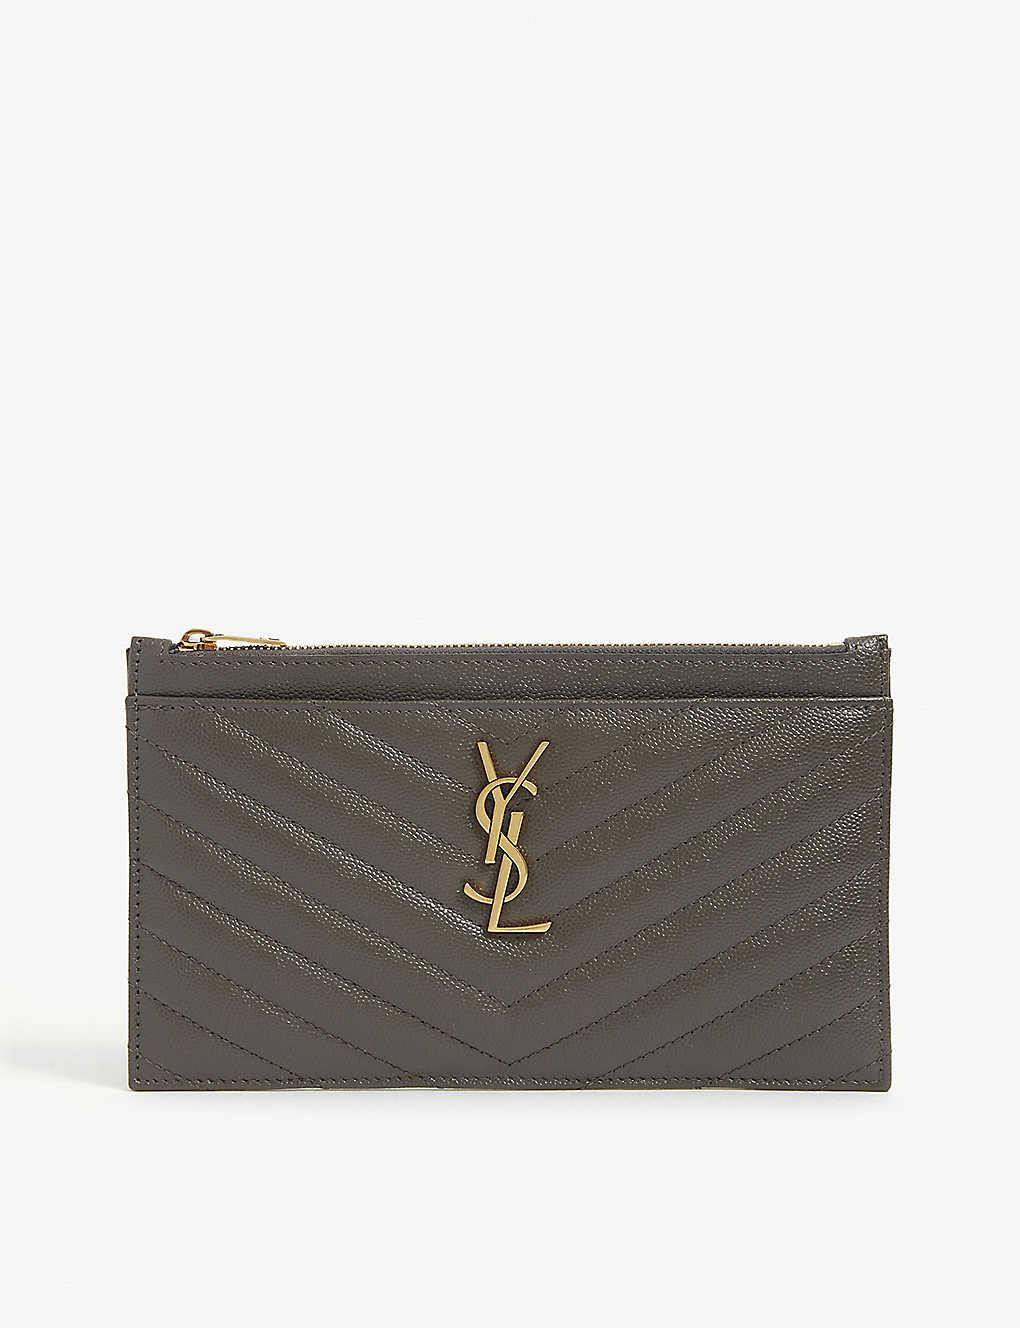 SAINT LAURENT: Monogram quilted leather pouch